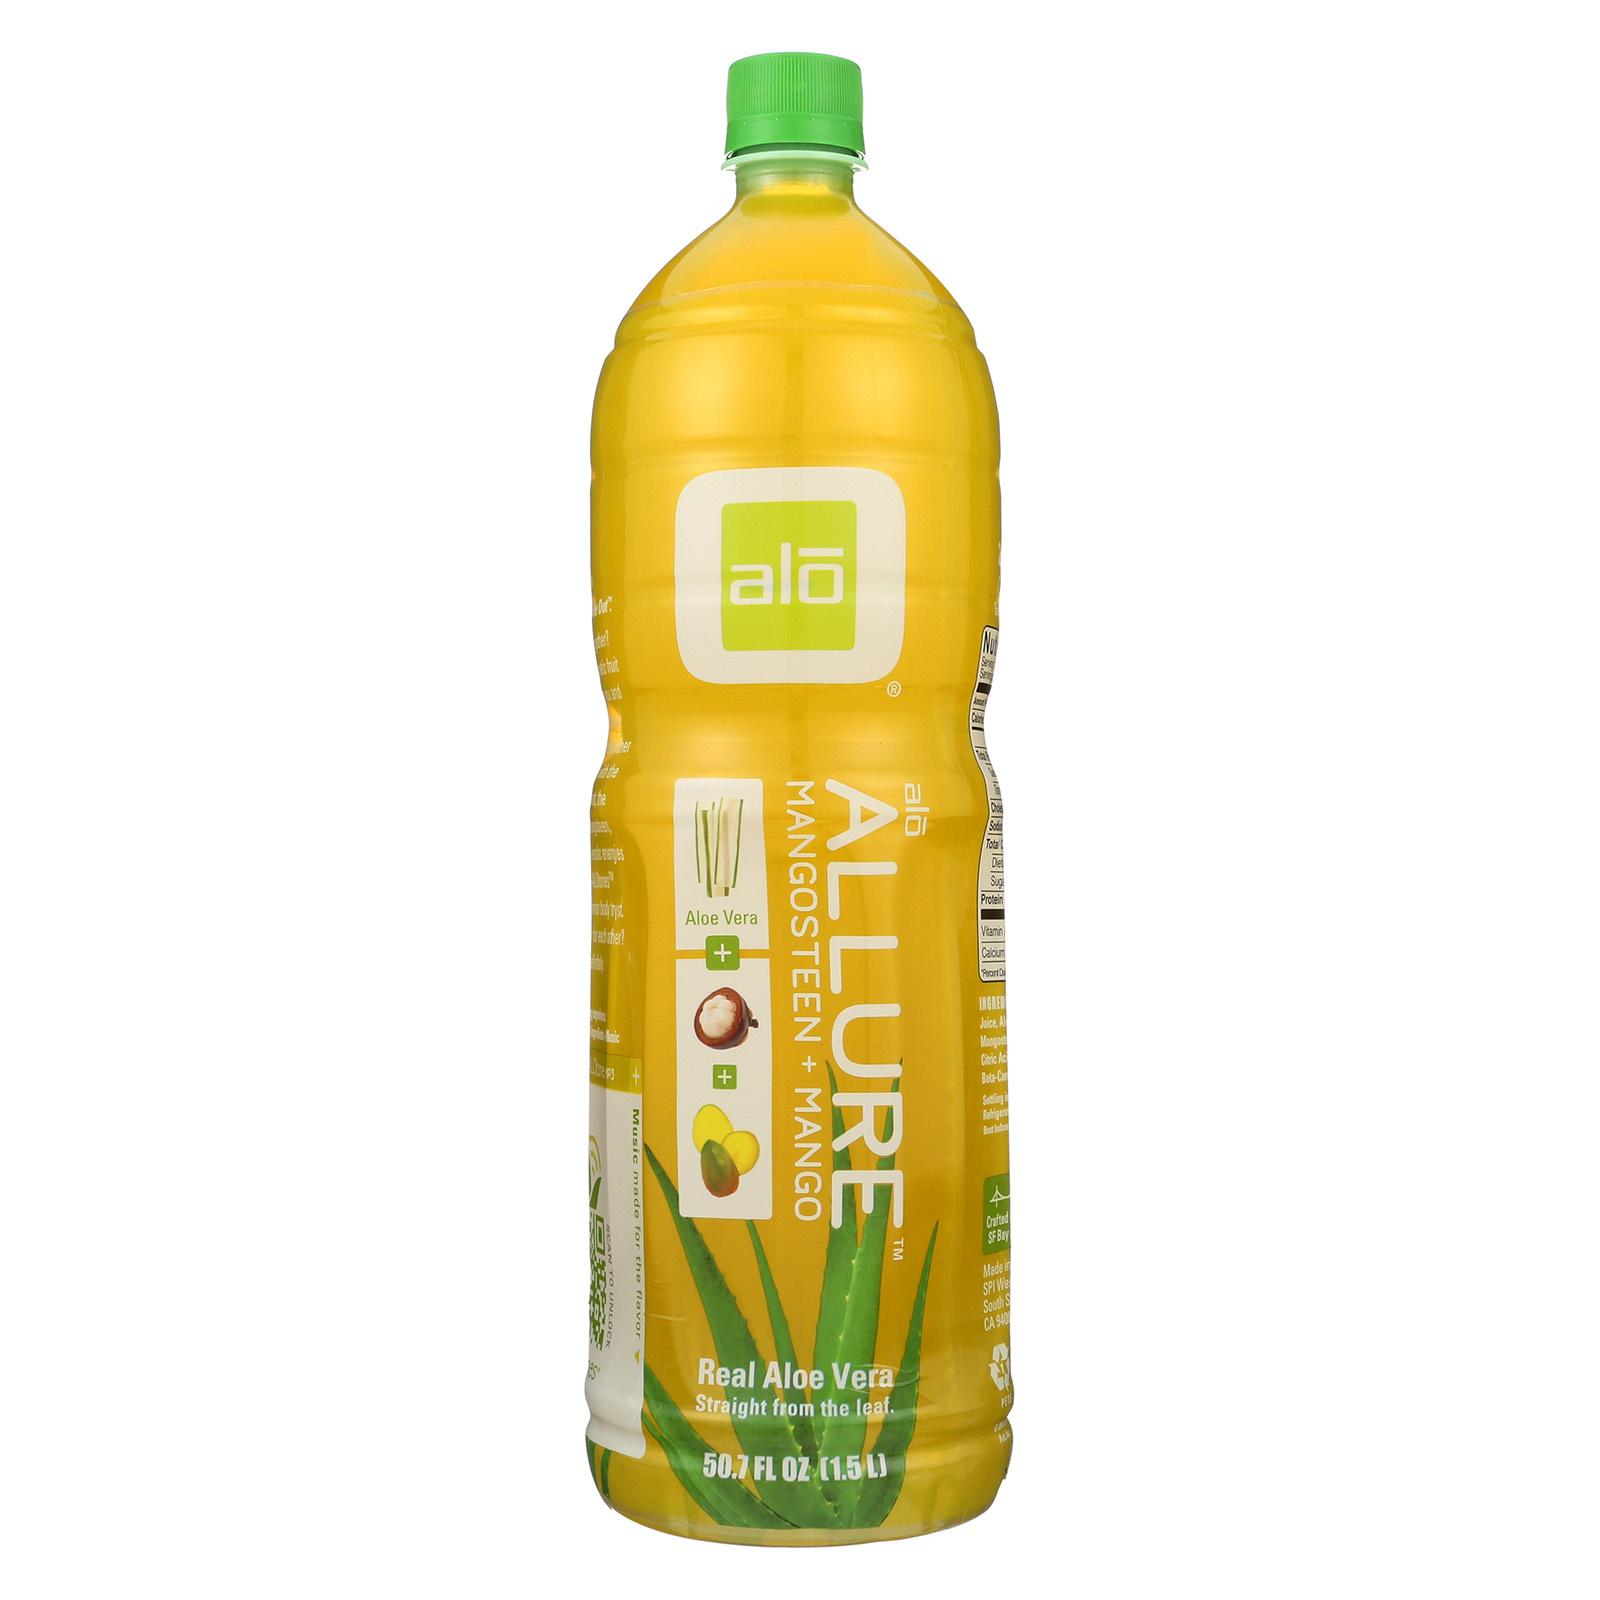 Alo Original Allure Aloe Vera Juice Drink - Mangosteen and Mango - Case of 6 - 50.7 fl oz.